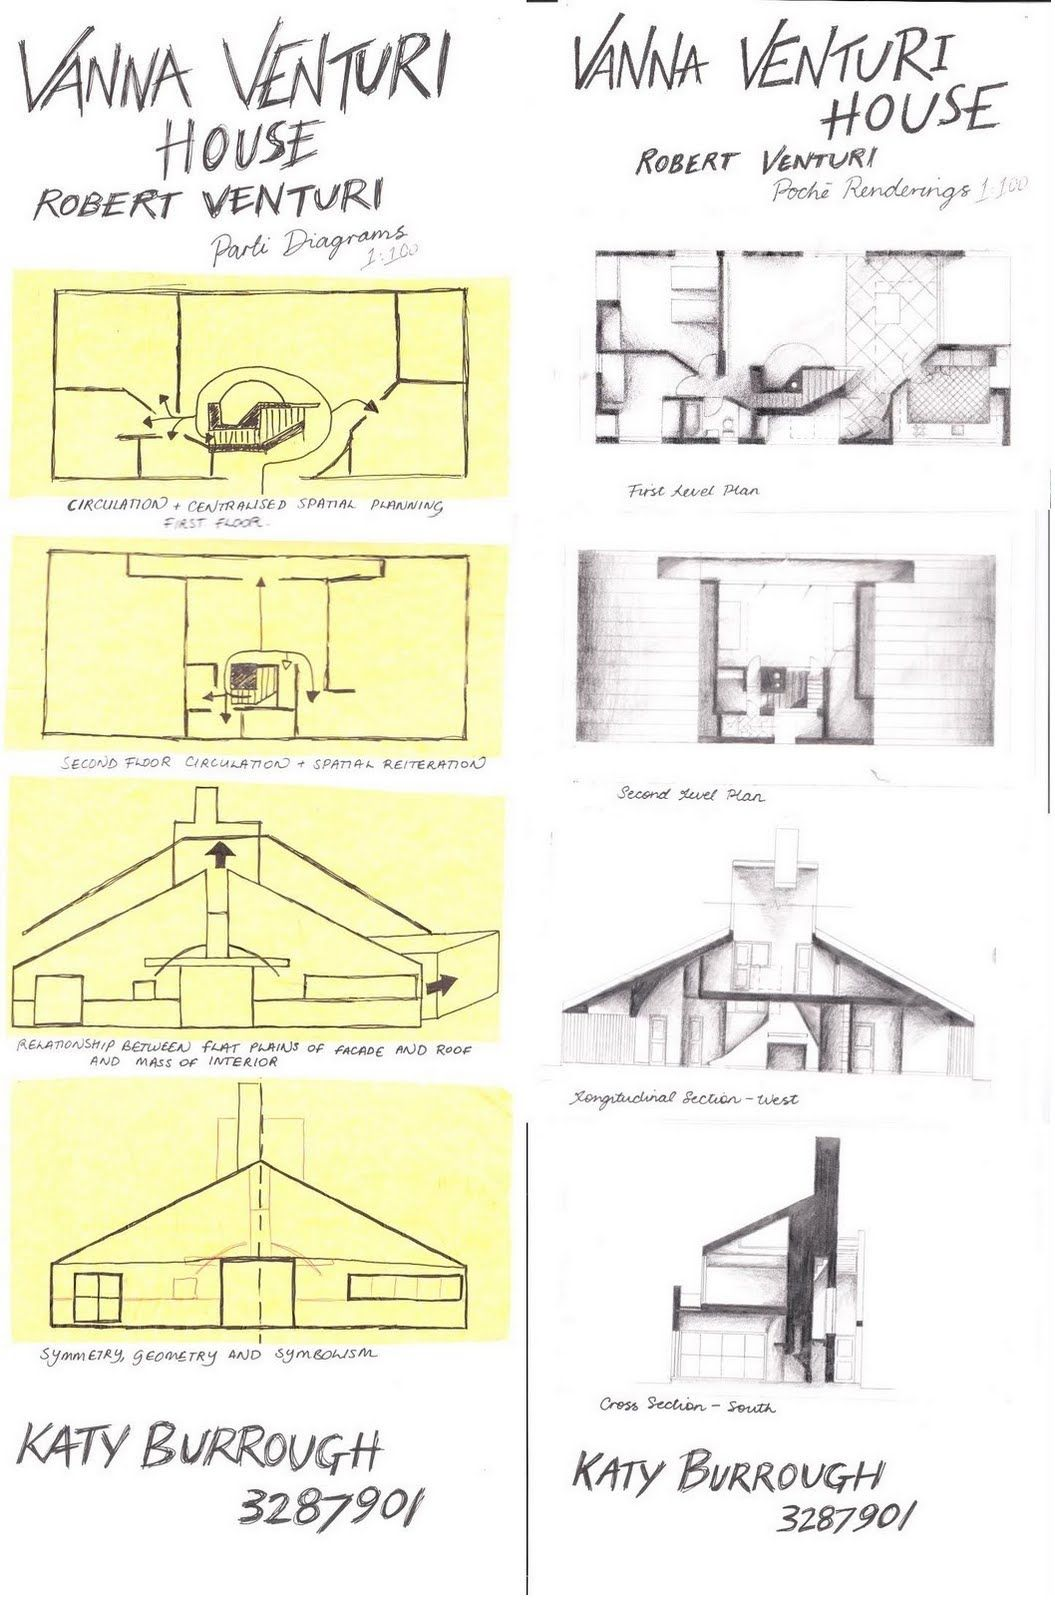 denise scott brown architectural design studio amazing architecture architecture design ground floor [ 1055 x 1600 Pixel ]